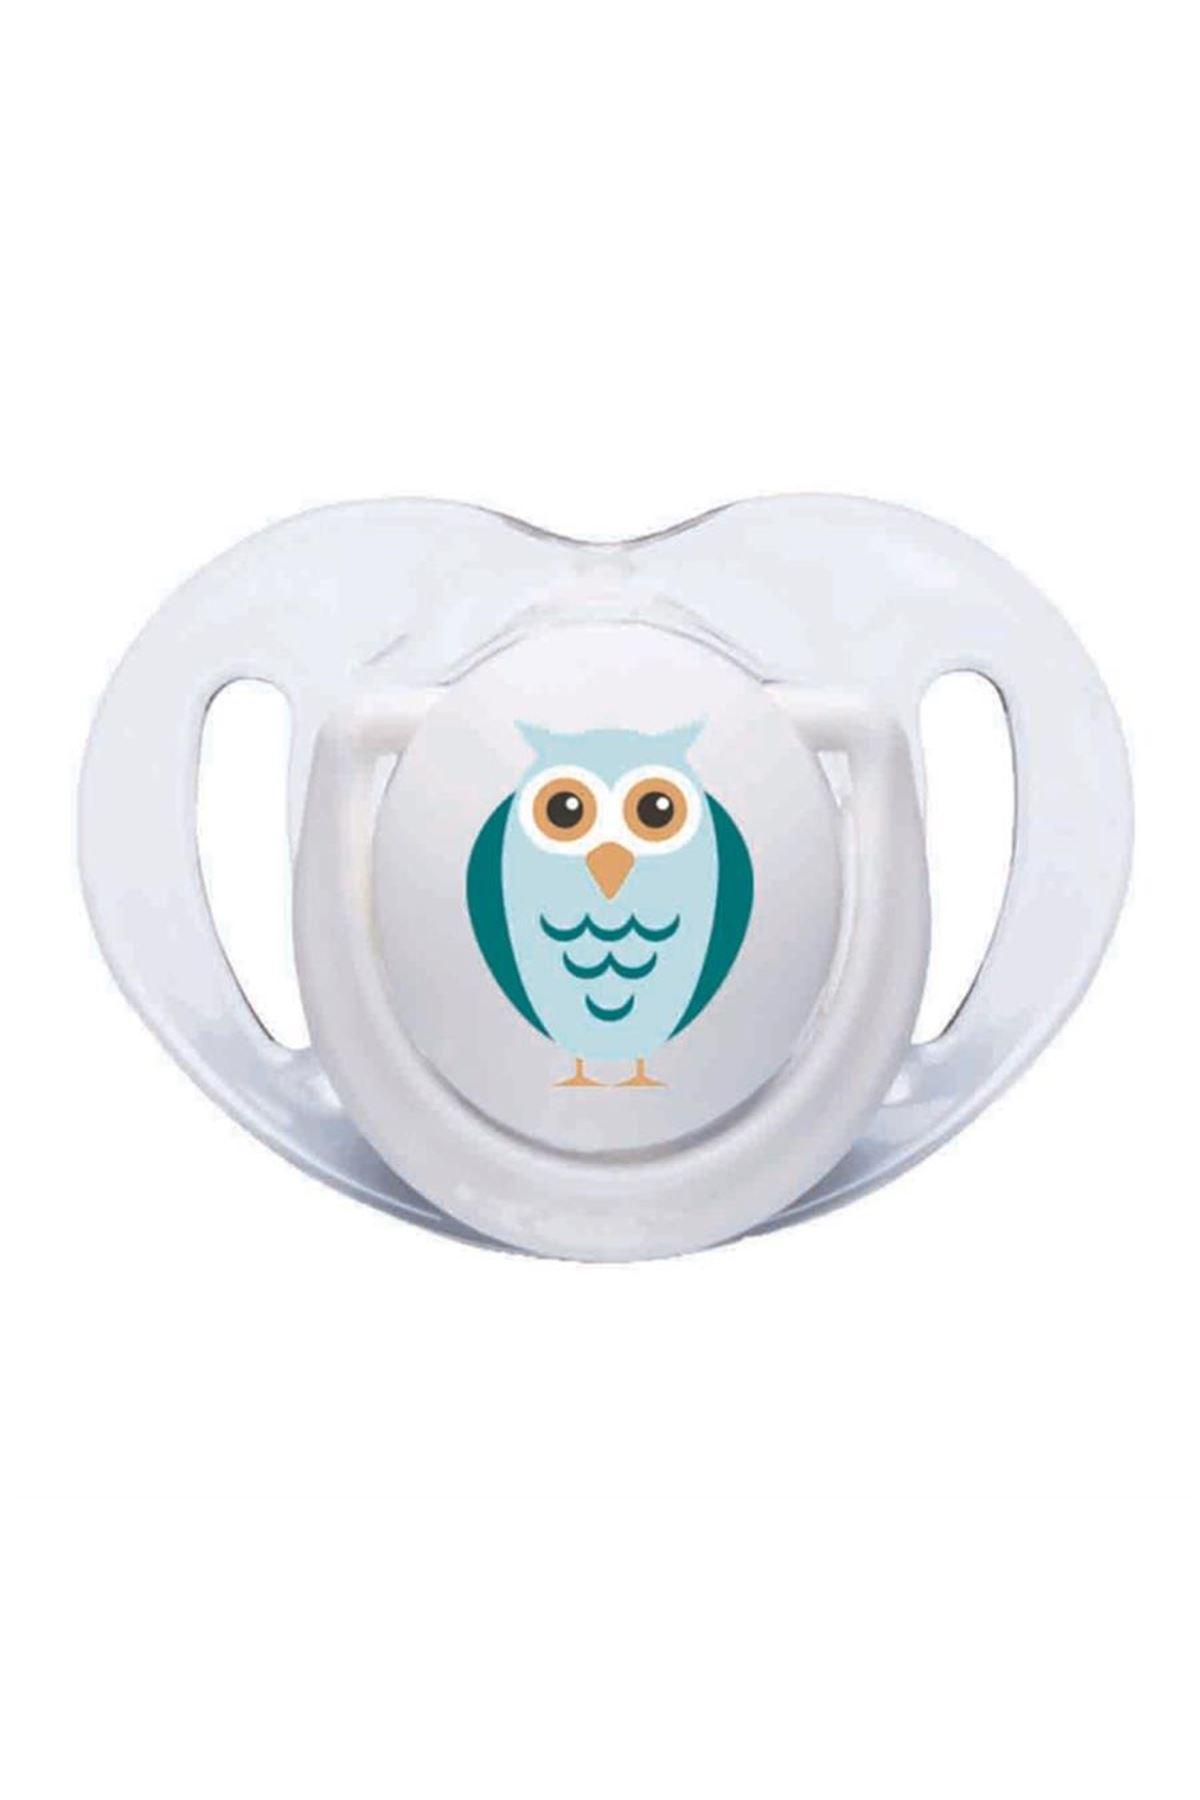 Mamajoo Silikon Ortodontik İkili Emzik Beyaz Baykuş / 6 ay +